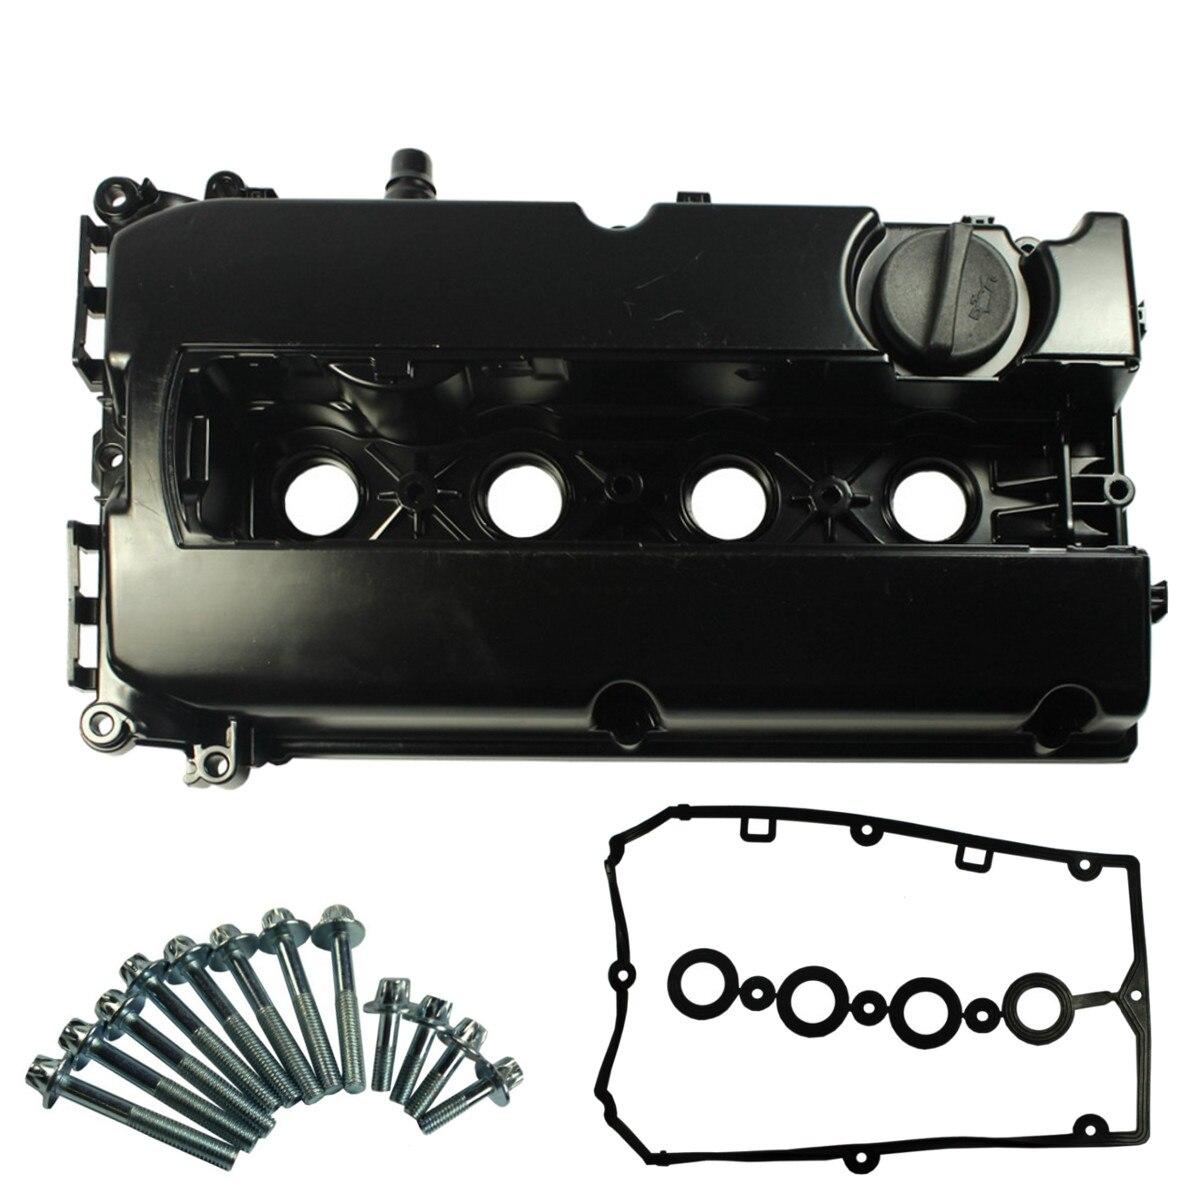 Car Engine Valve Cover Gasket Screws 55564395 55558673 ECVMG001 For Chevrolet For Cruze 2008-2015